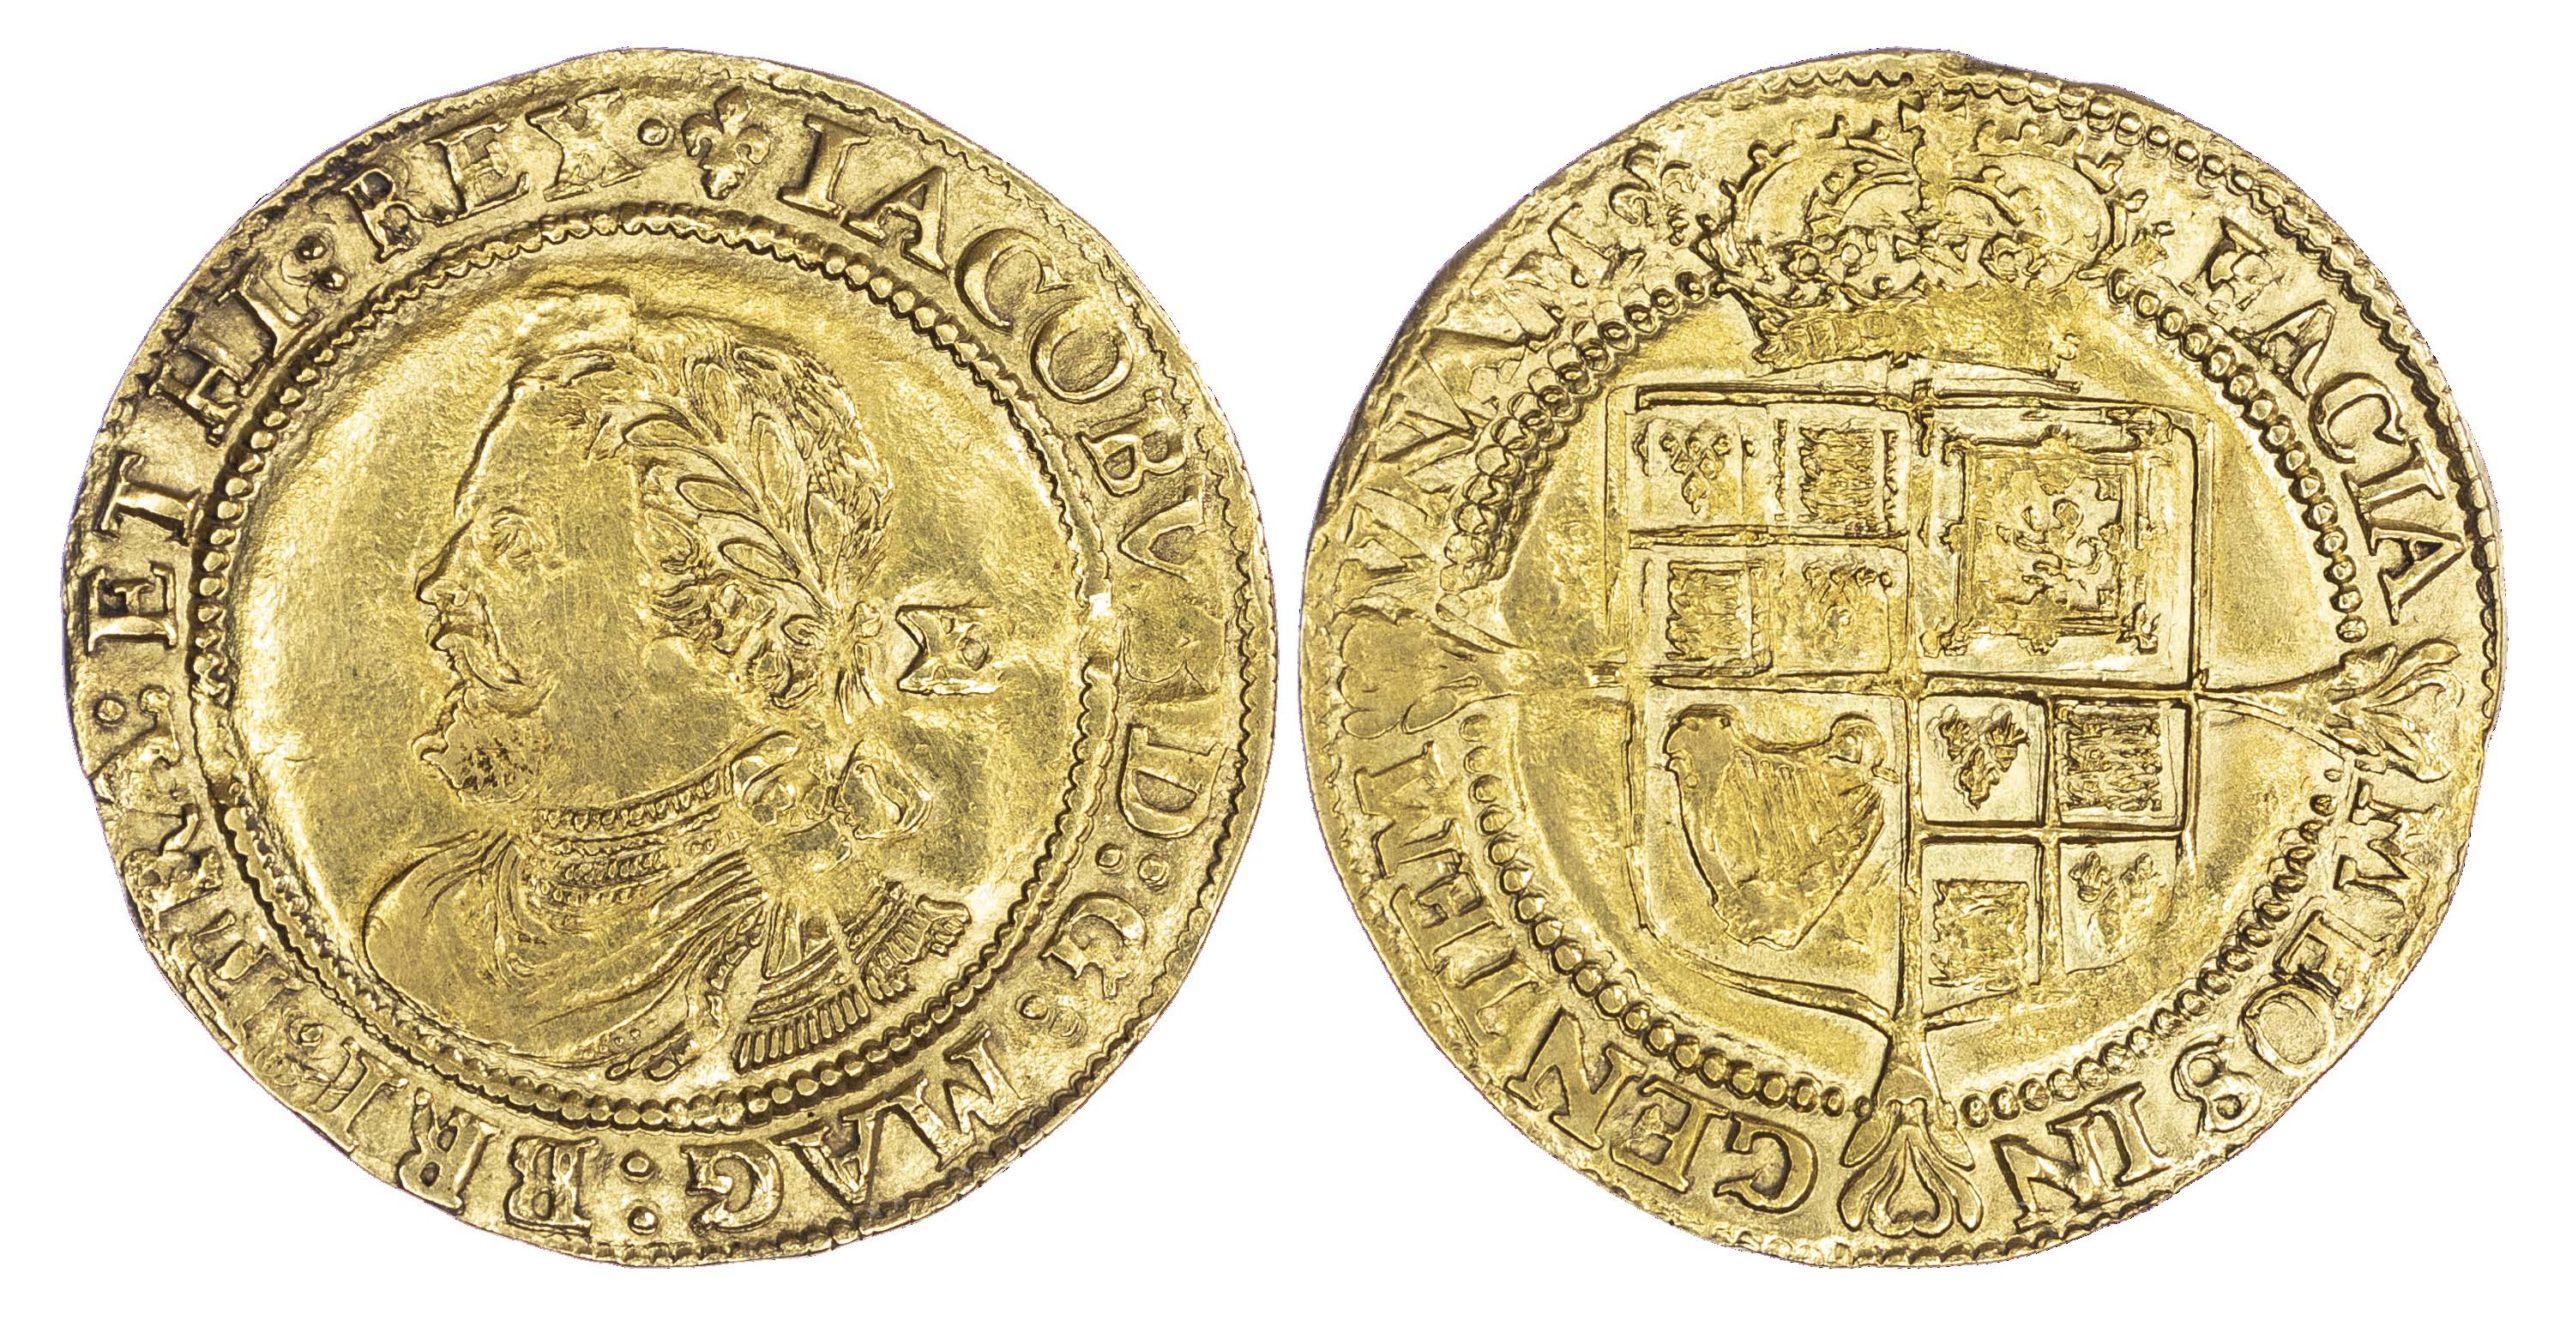 James I Laurel Third Coinage mm Lis Good Very Fine